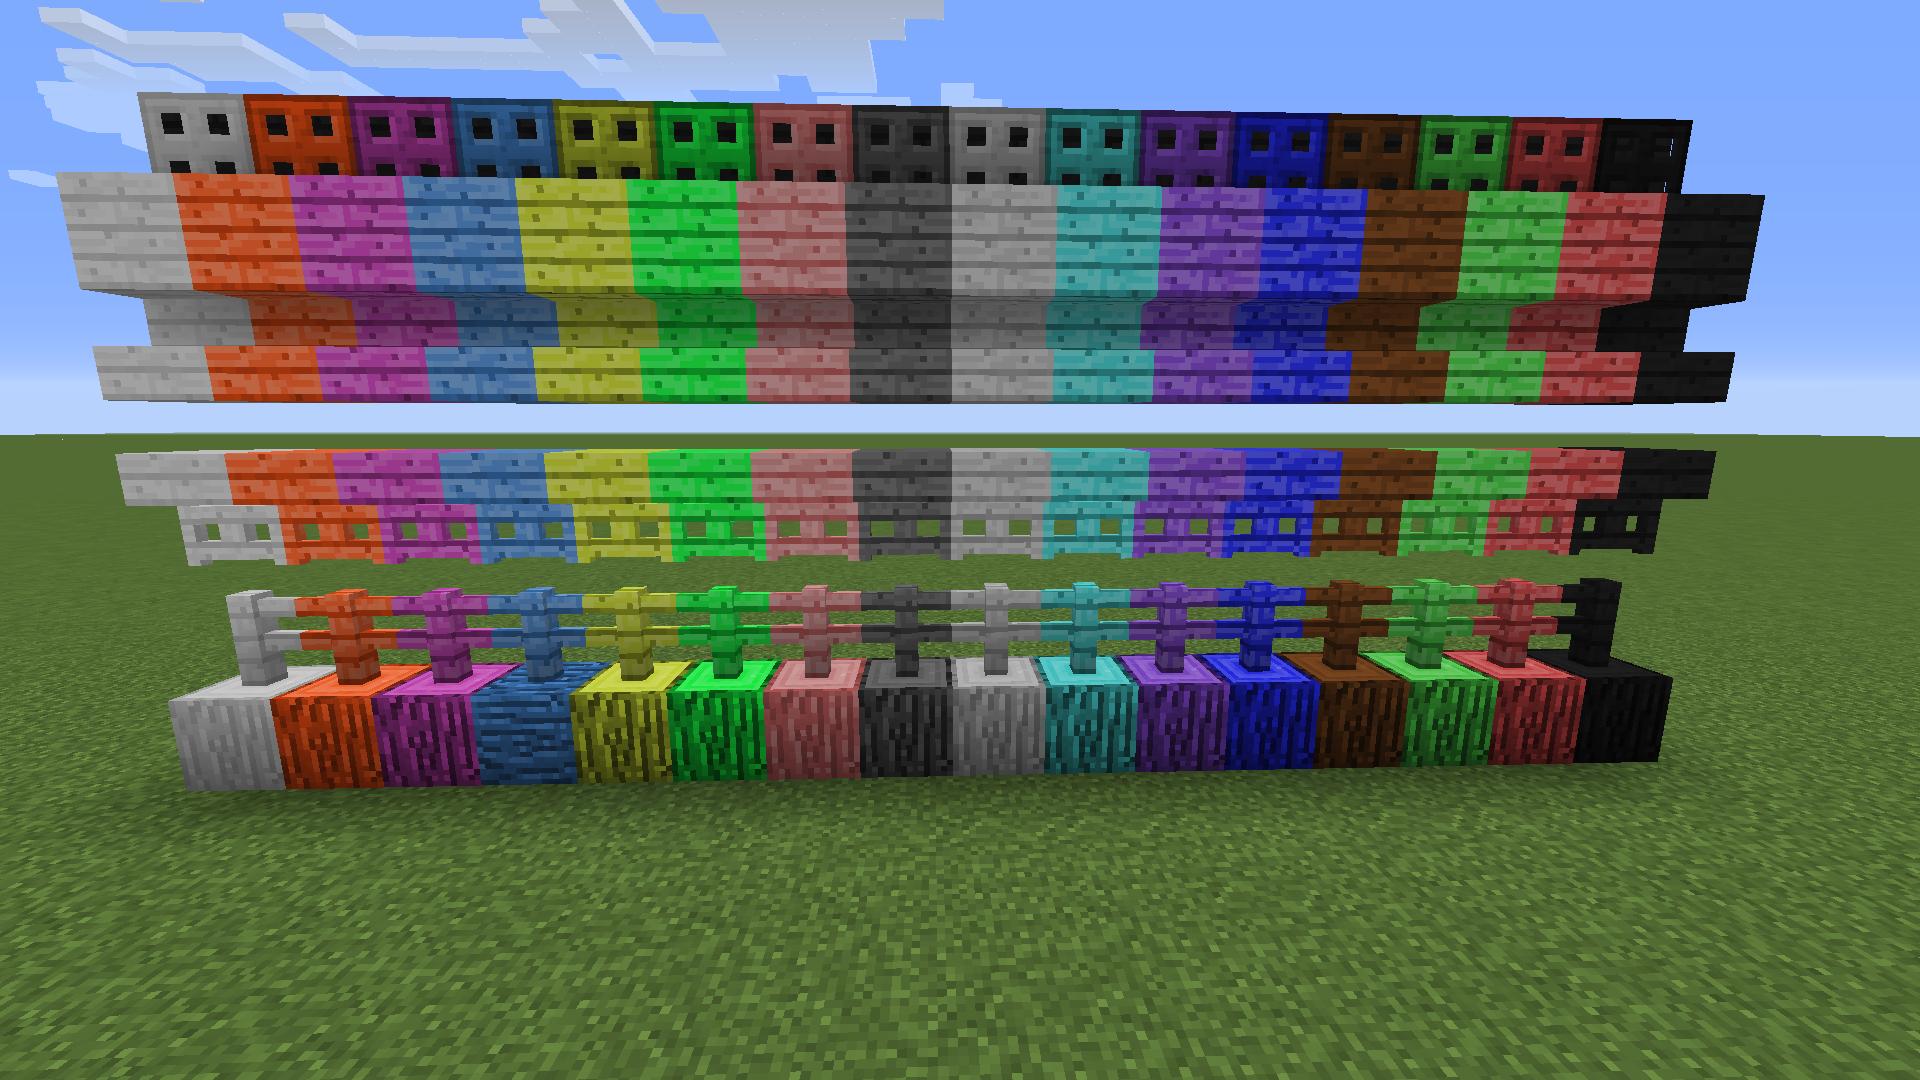 Galactic Colored Blocks Mod 1 14 4 1 13 2 1 12 2 1 11 2 1 10 2 1 8 9 1 7 10 Minecraft Modpacks Minecraft Modpacks Minecraft Minecraft Mods